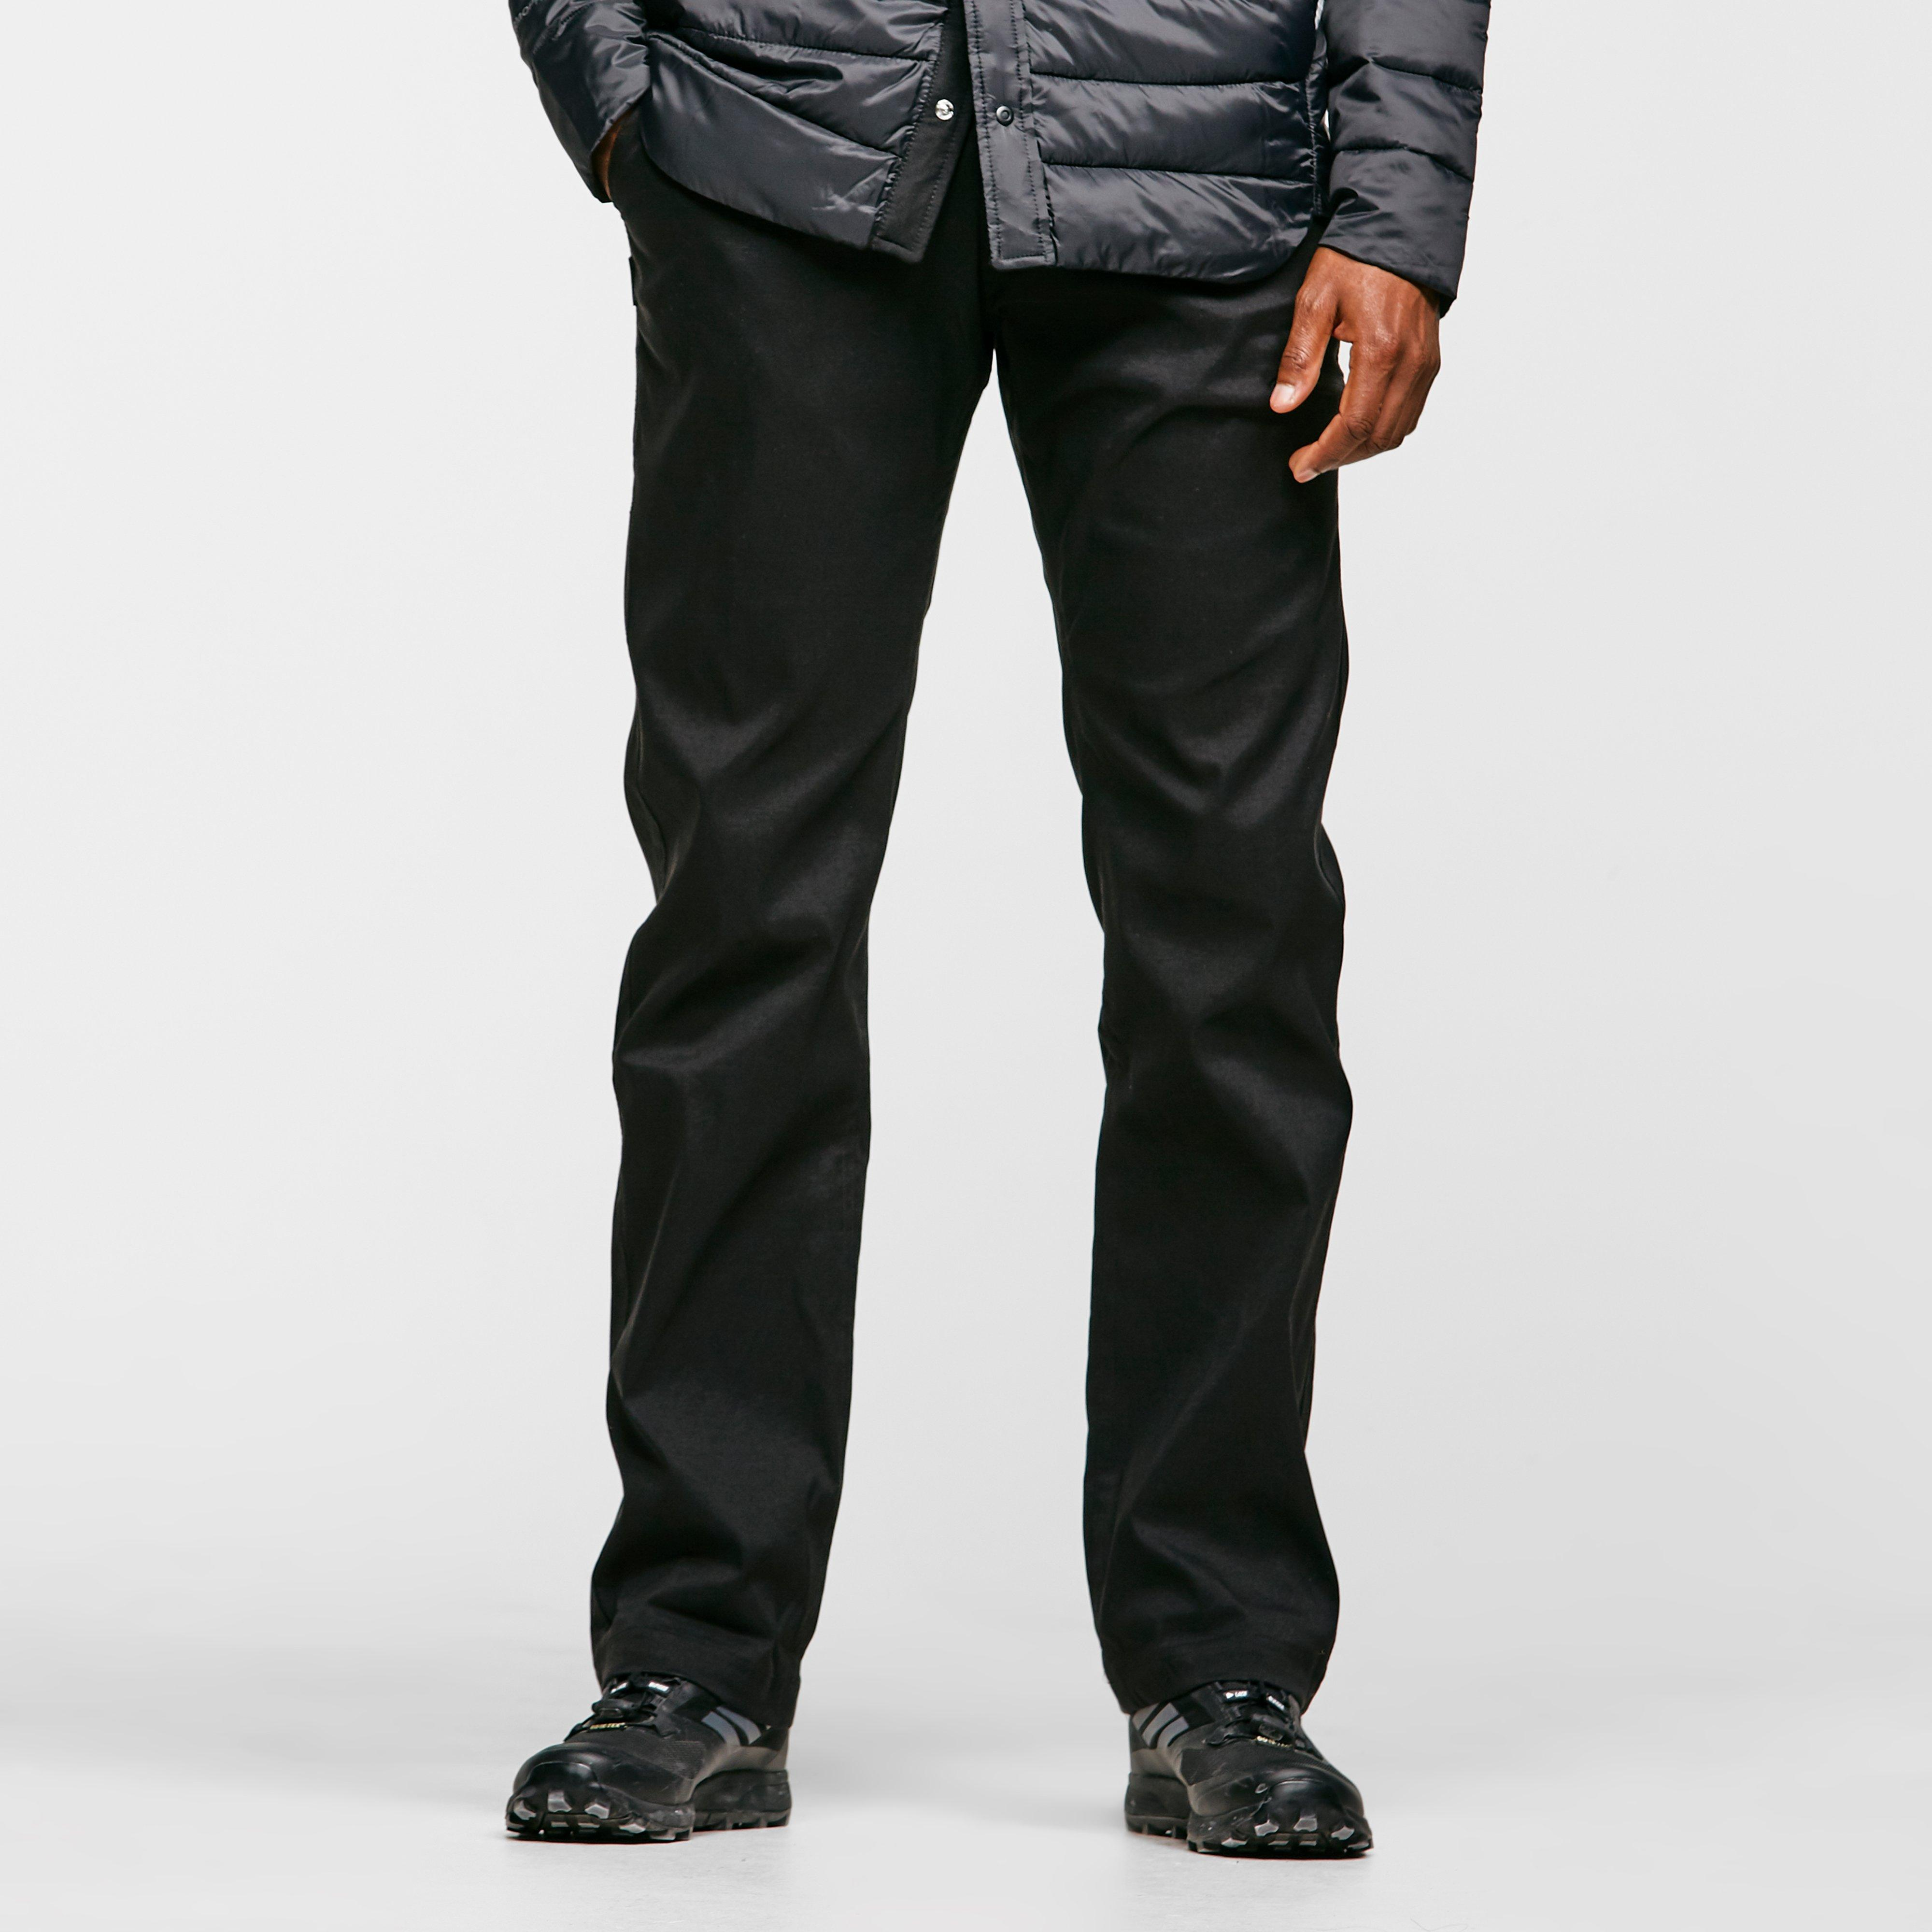 Craghoppers Men's Kiwi Pro Trousers - Black/Blk, Black